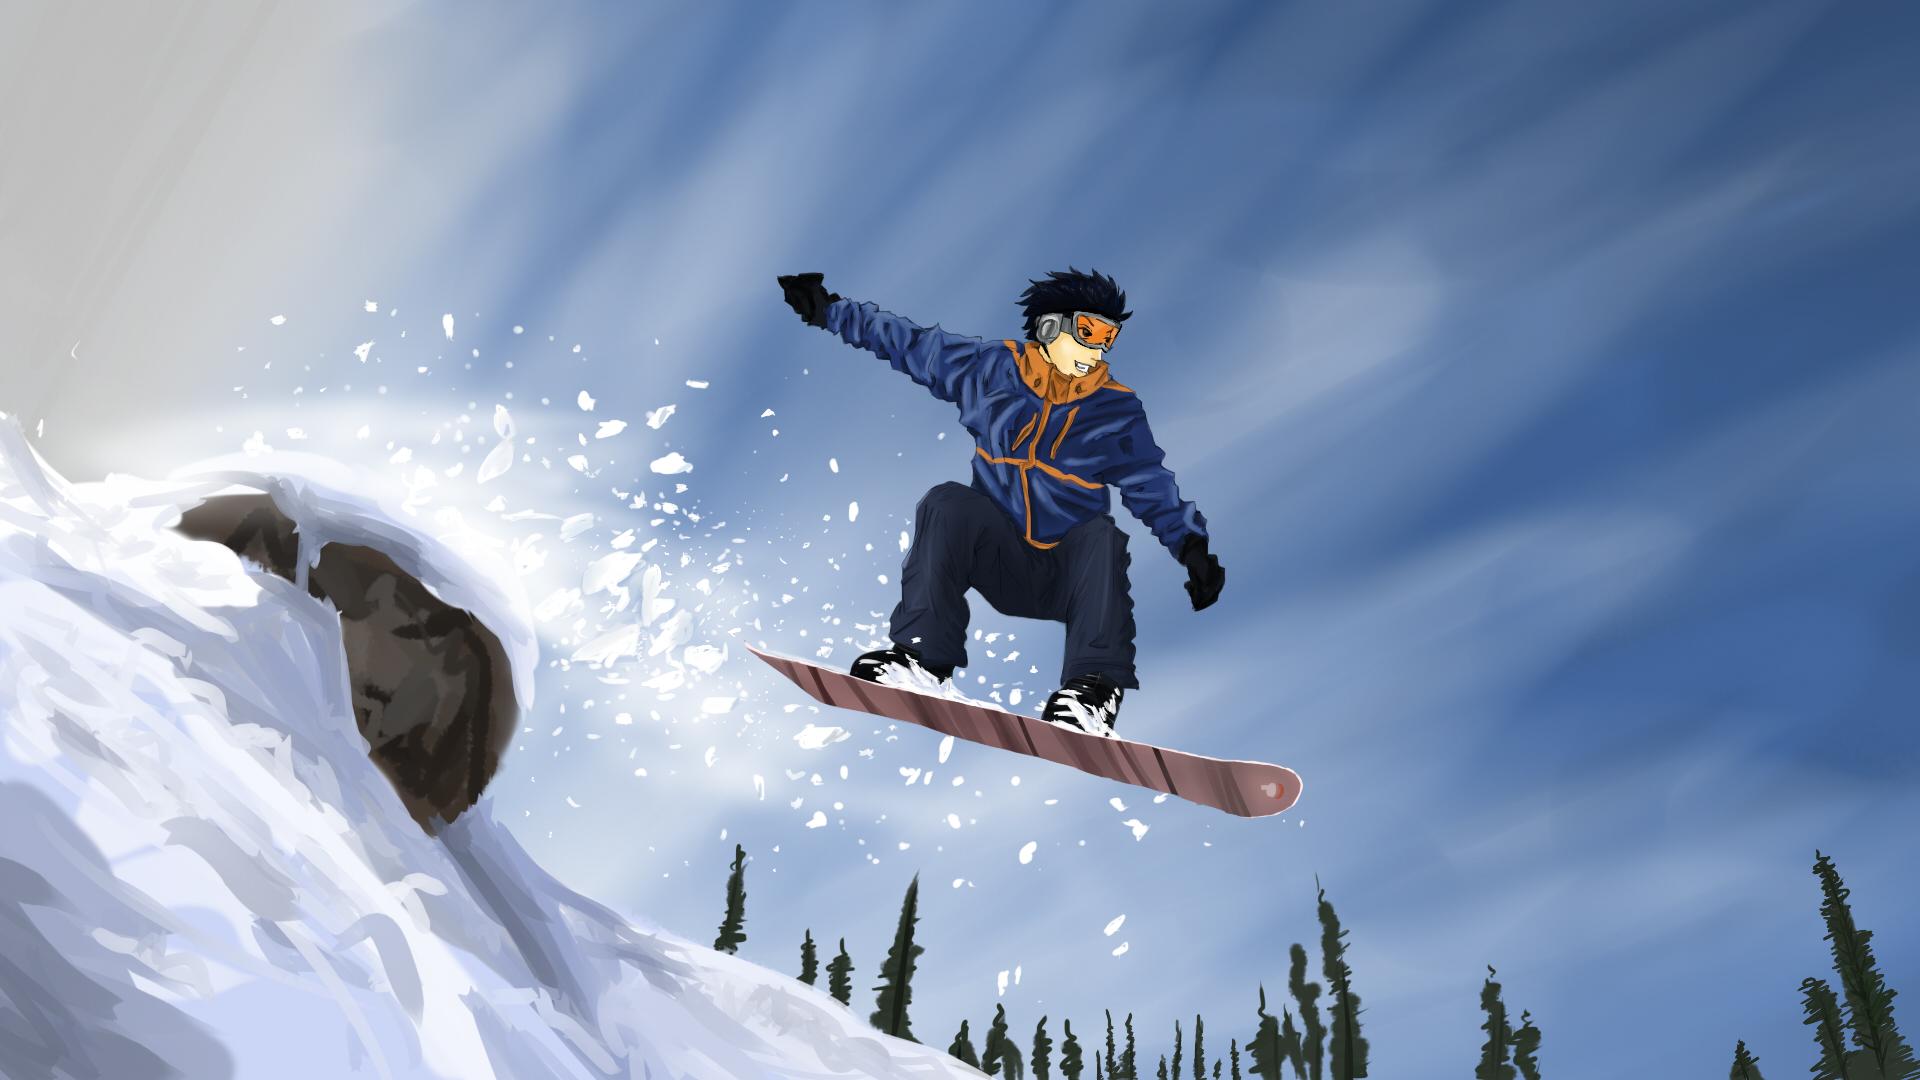 Free Animated Fall Desktop Wallpaper Winter Sports Wallpapers